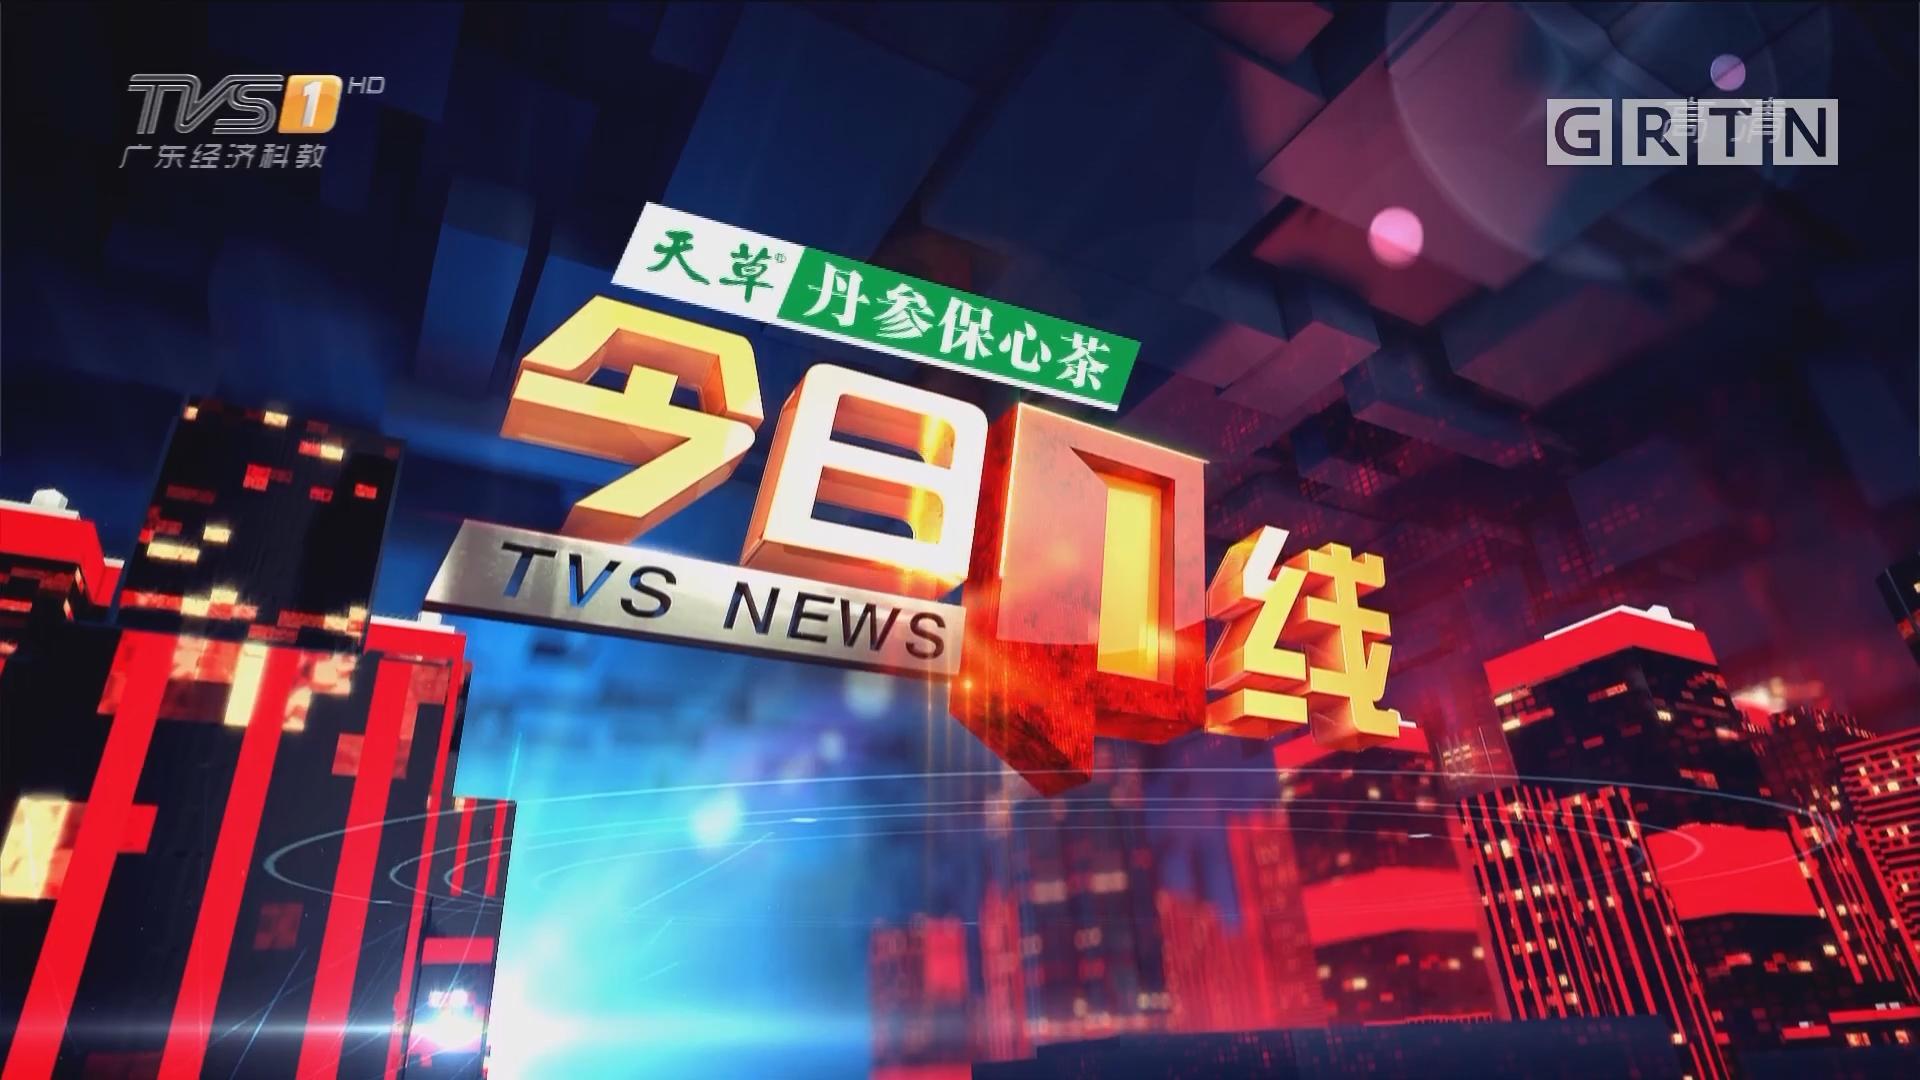 [HD][2018-09-10]今日一线:关注台风消息:今年第23号台风即将生成 或登陆粤琼沿海